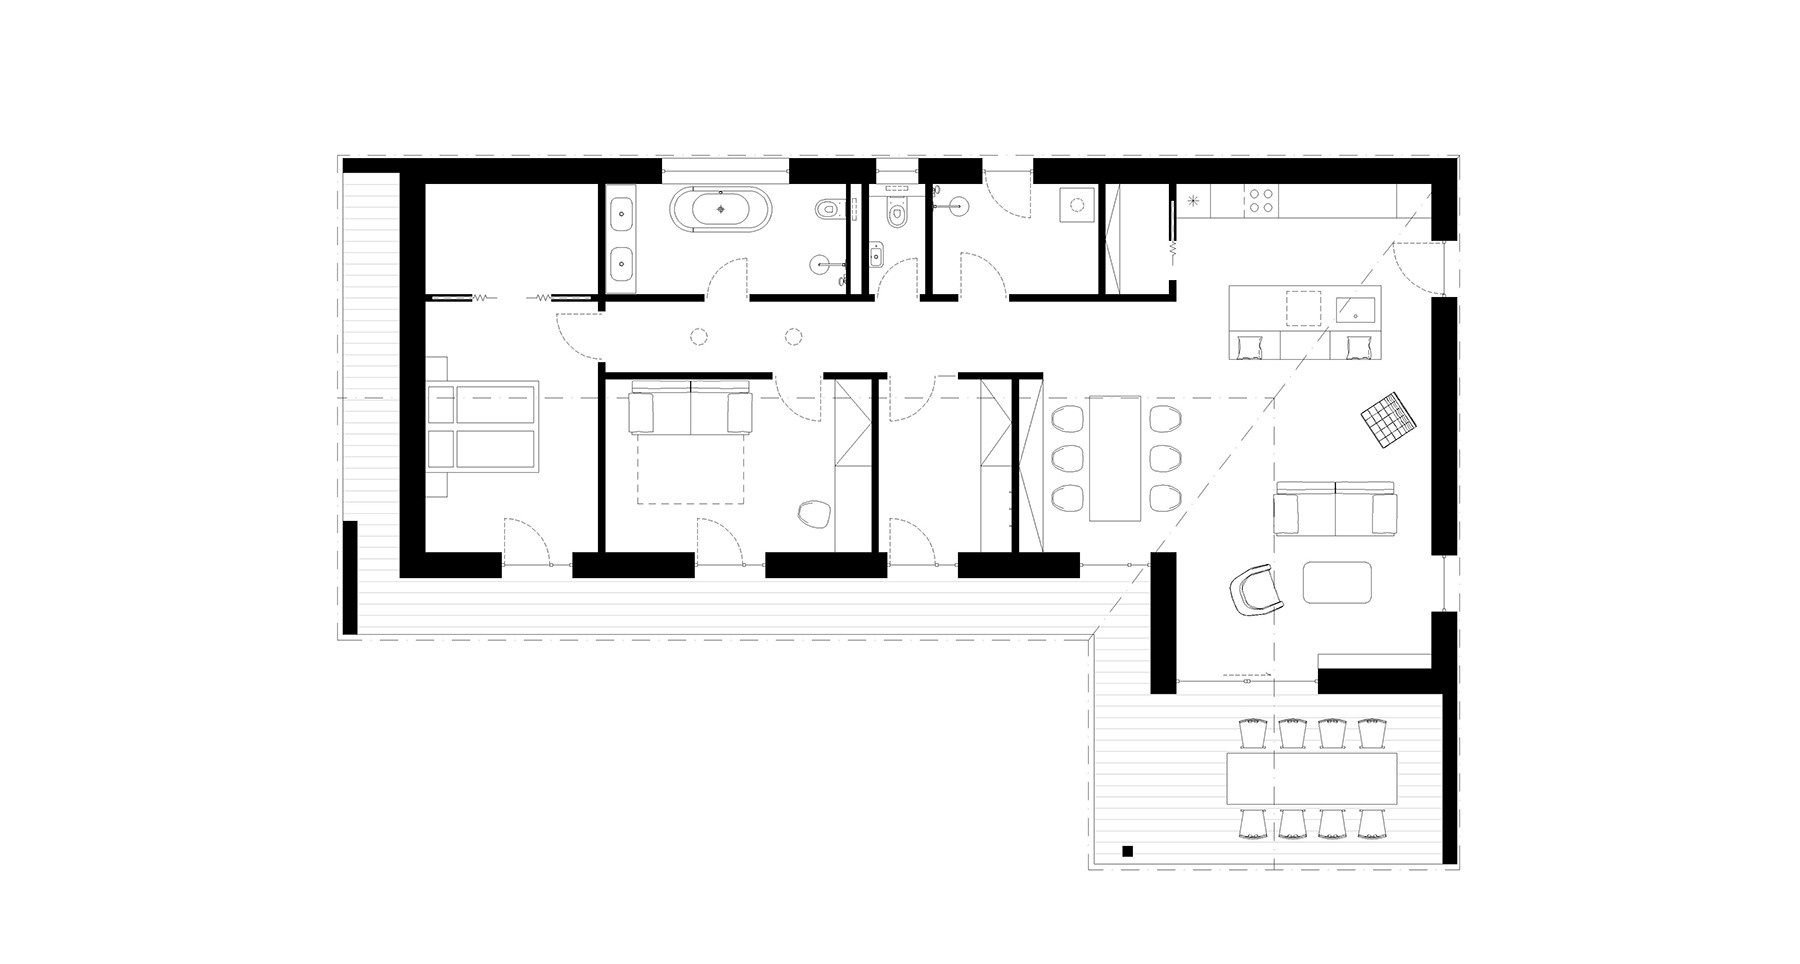 jednopodlazni_moderni_rodinny_dum_se_sikmou_strechou_dream_homes_plavec_pudorys